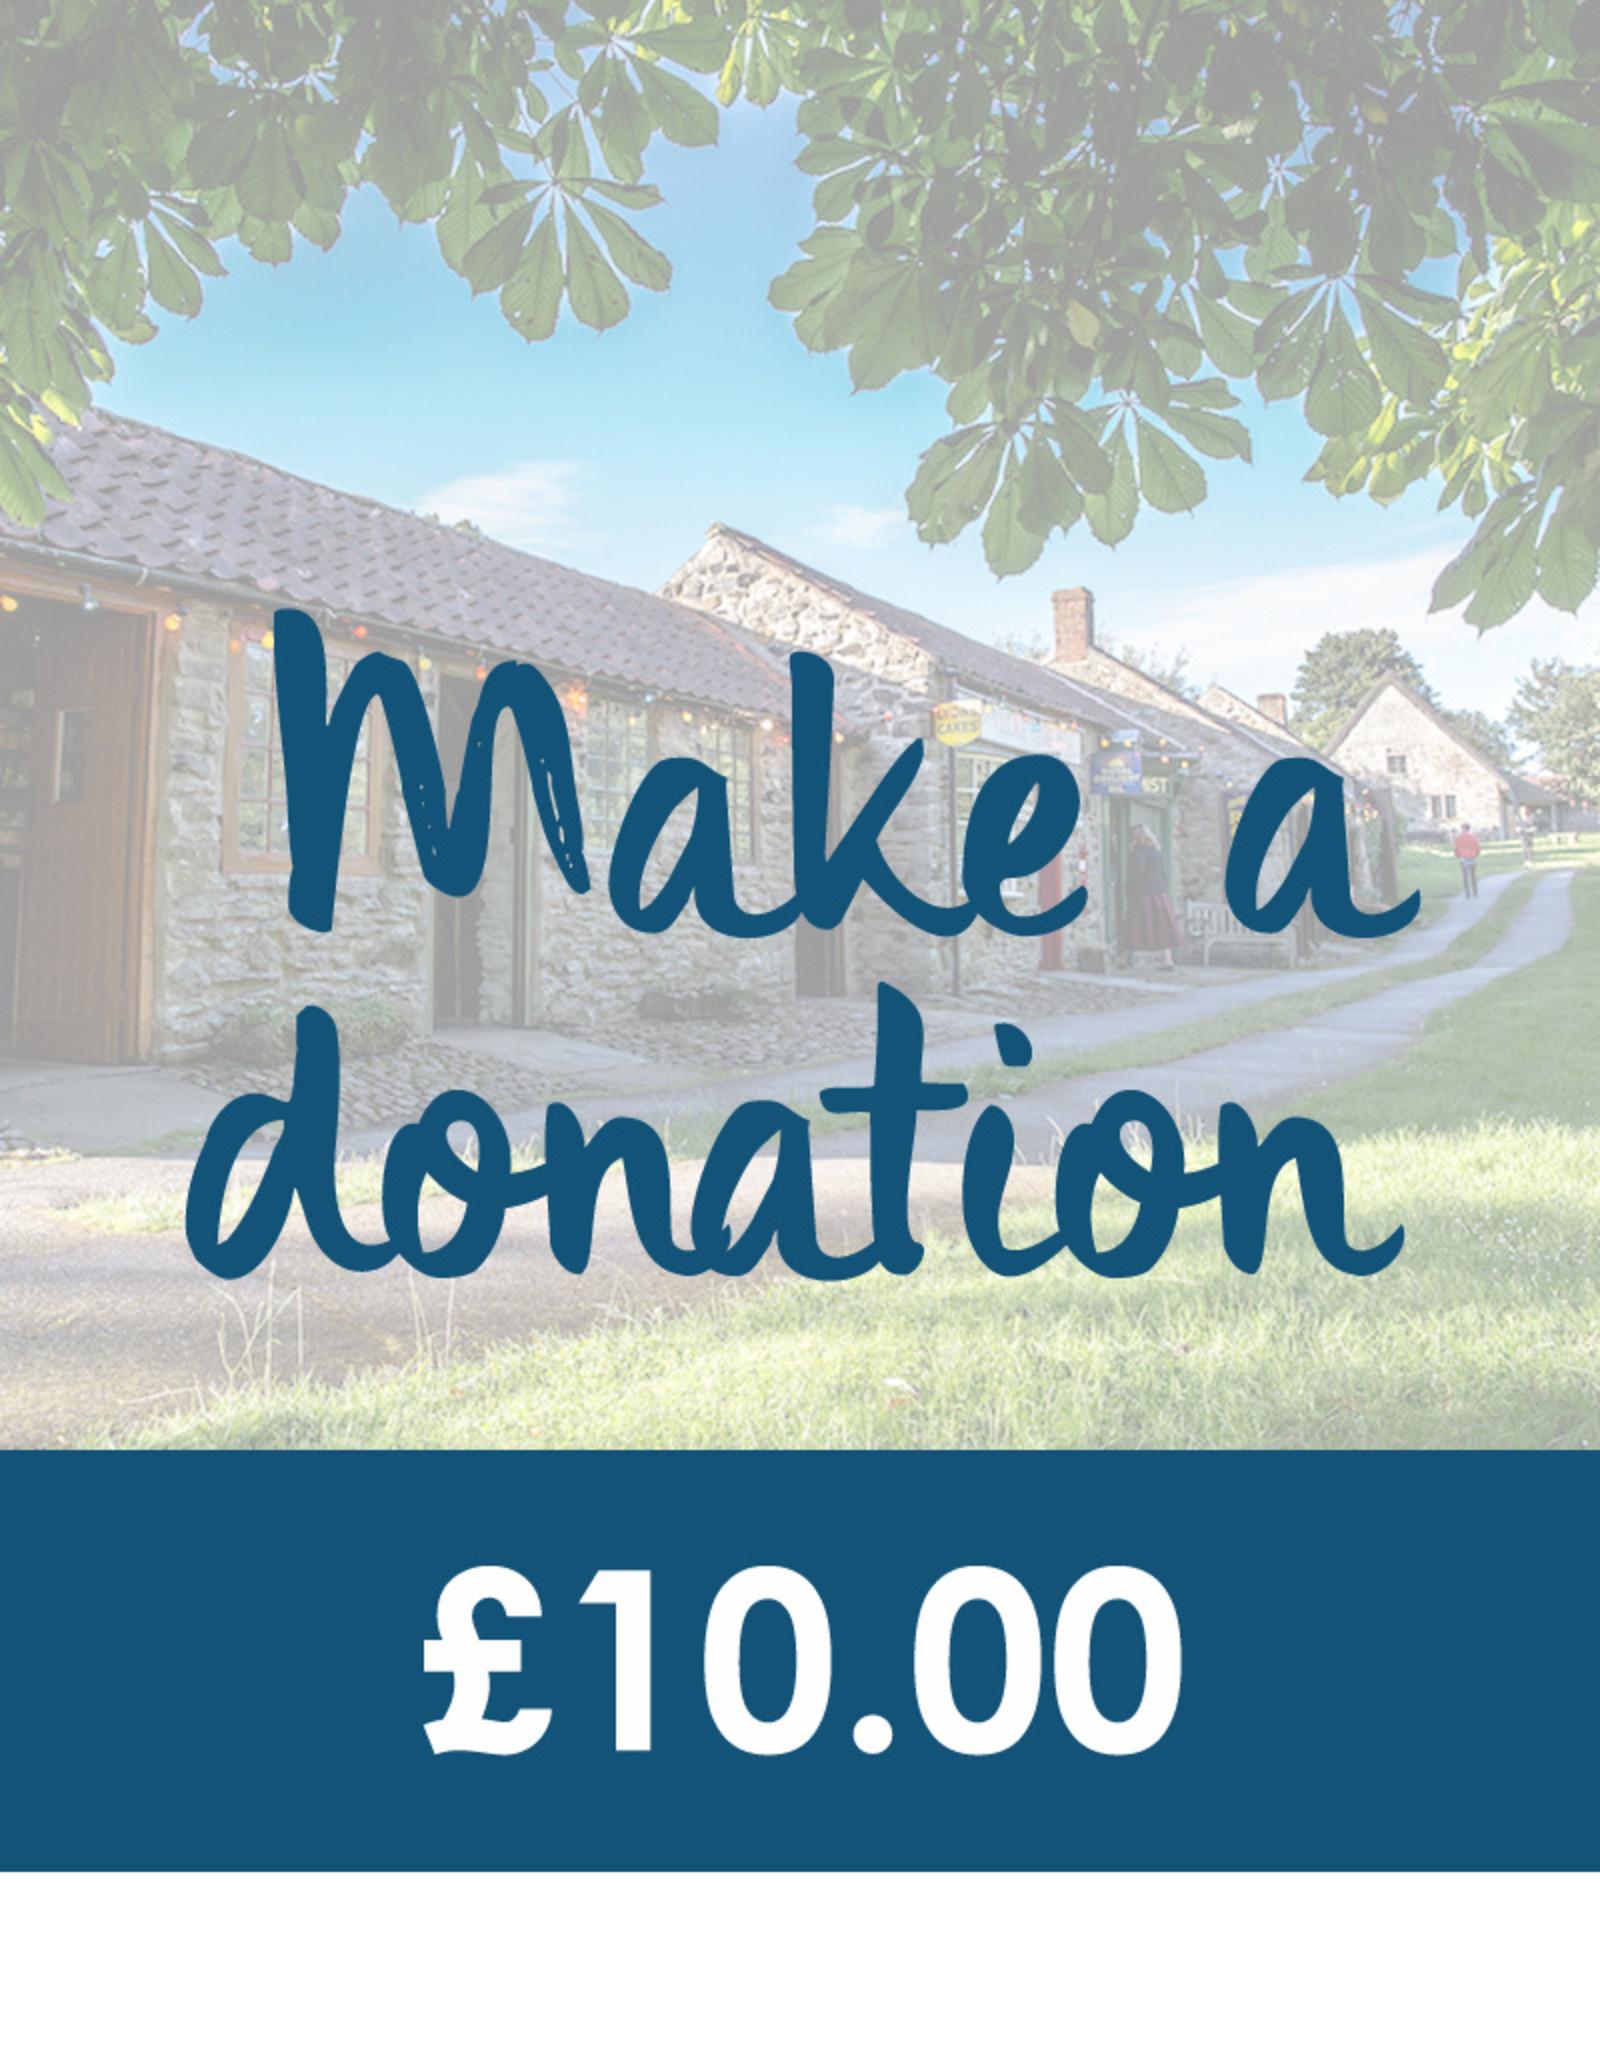 Make a Donation - £10.00